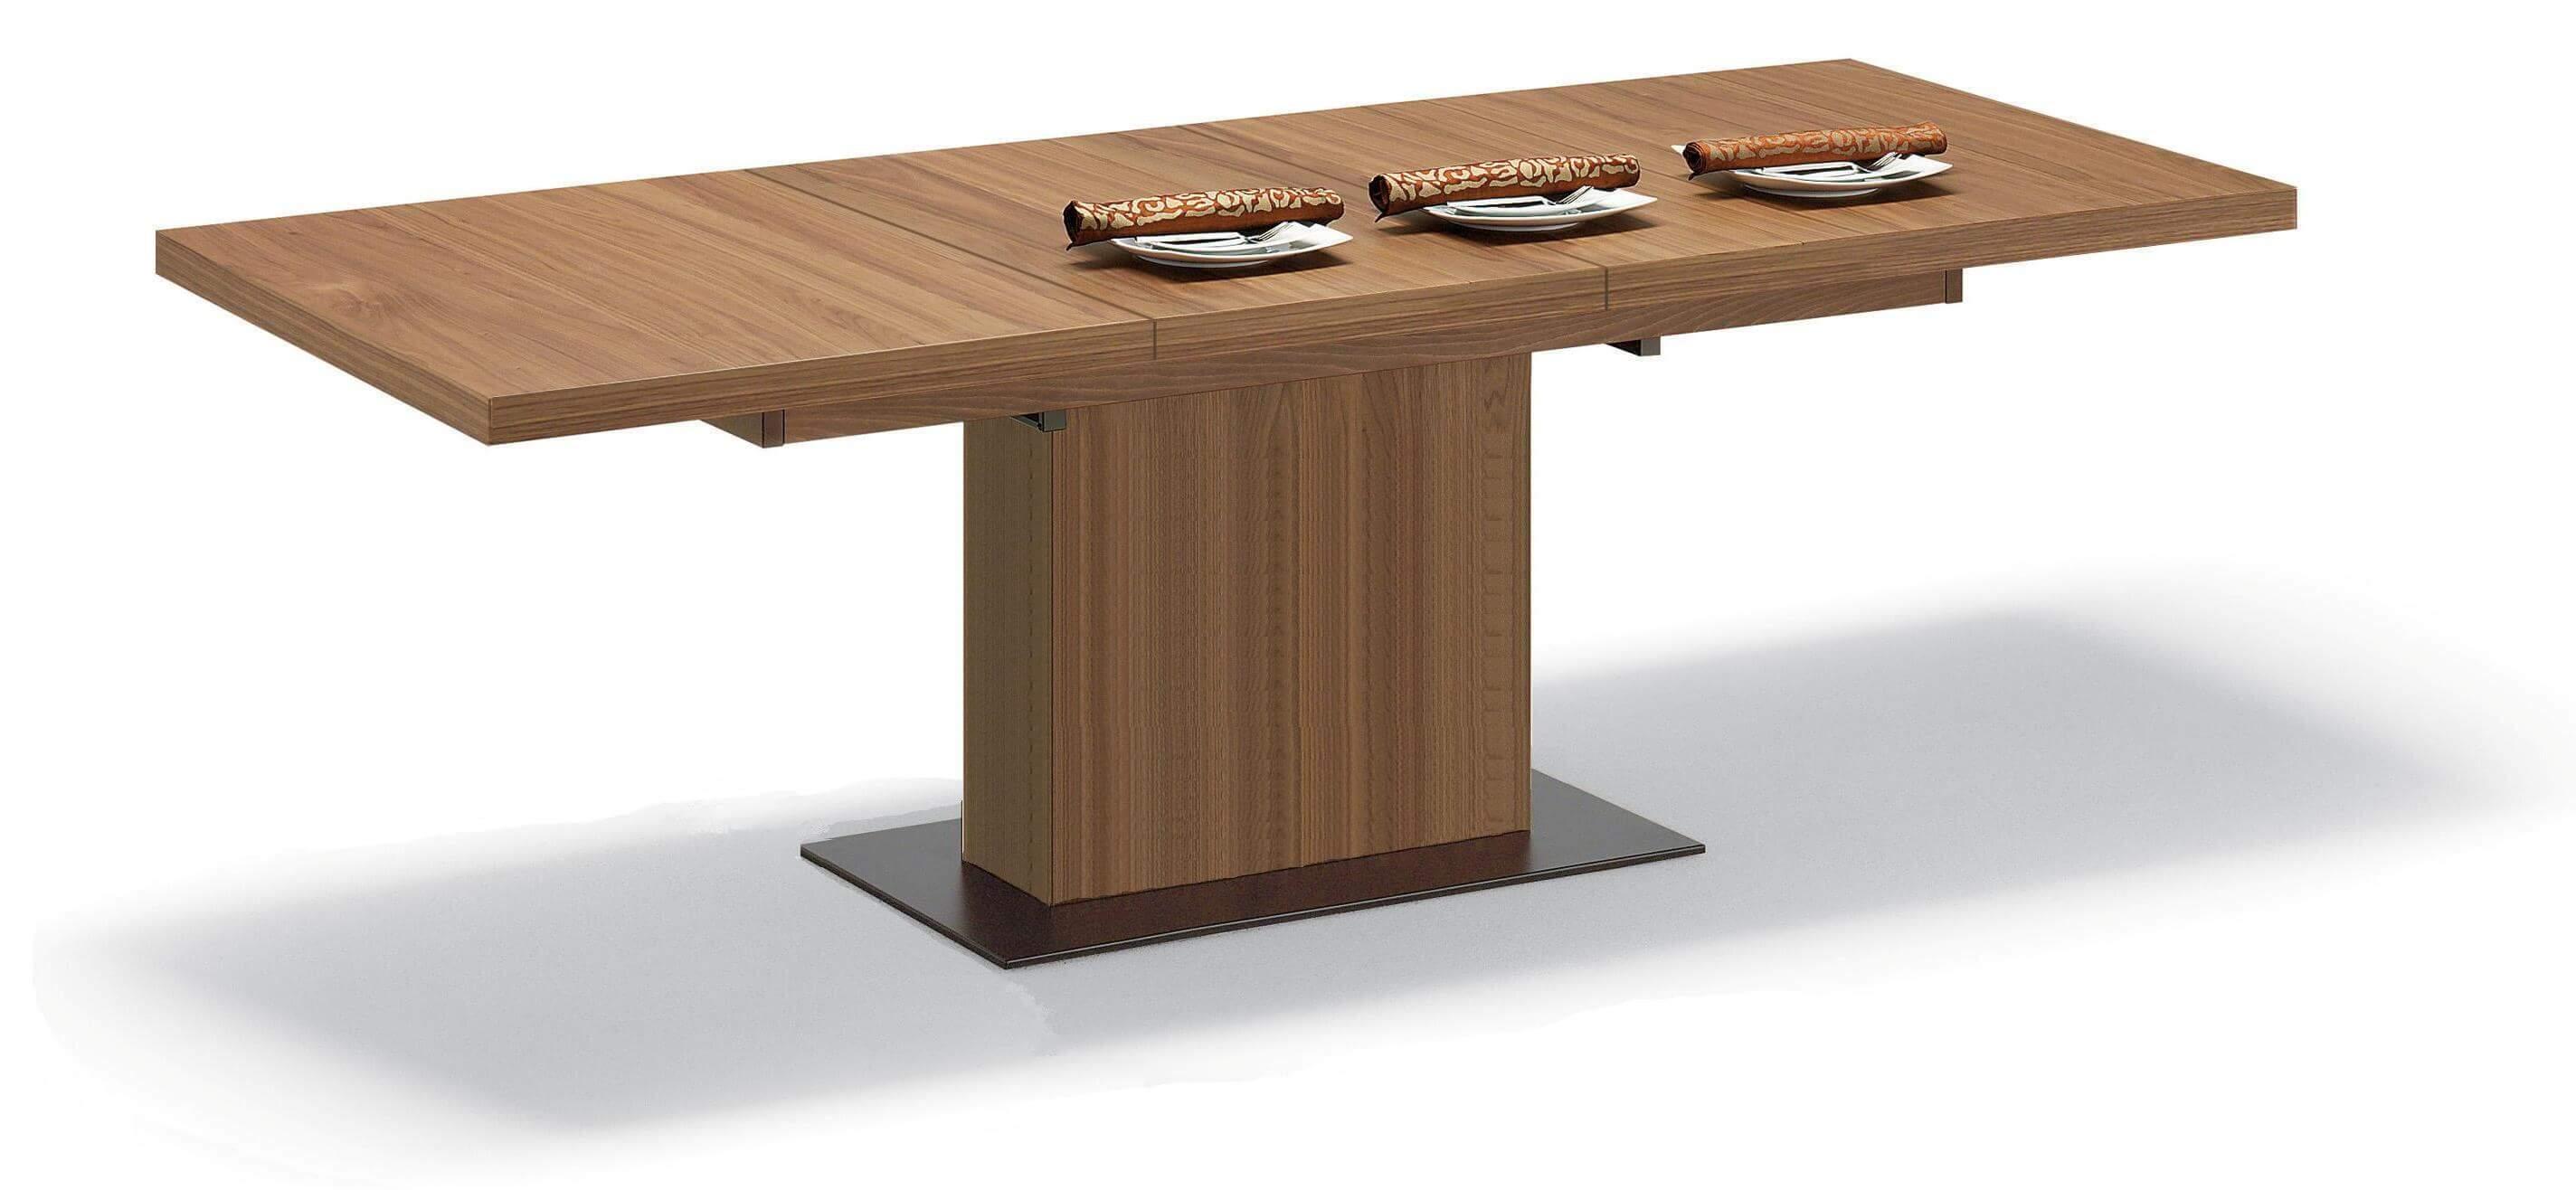 Vita Rectangular Table by DomItalia, Italy